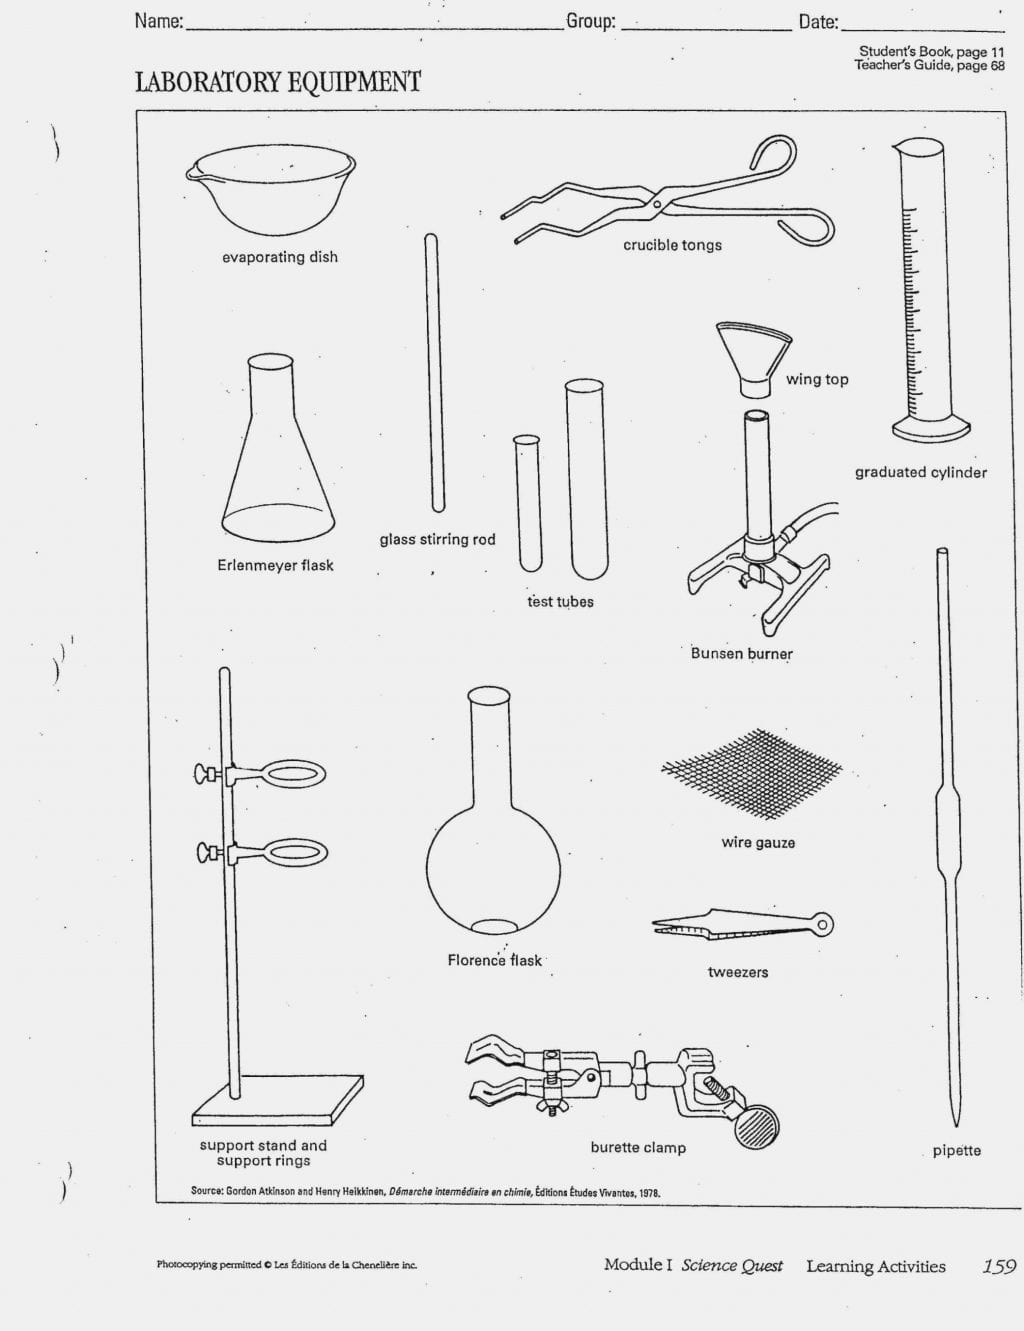 Middle School Lab Equipment Worksheet